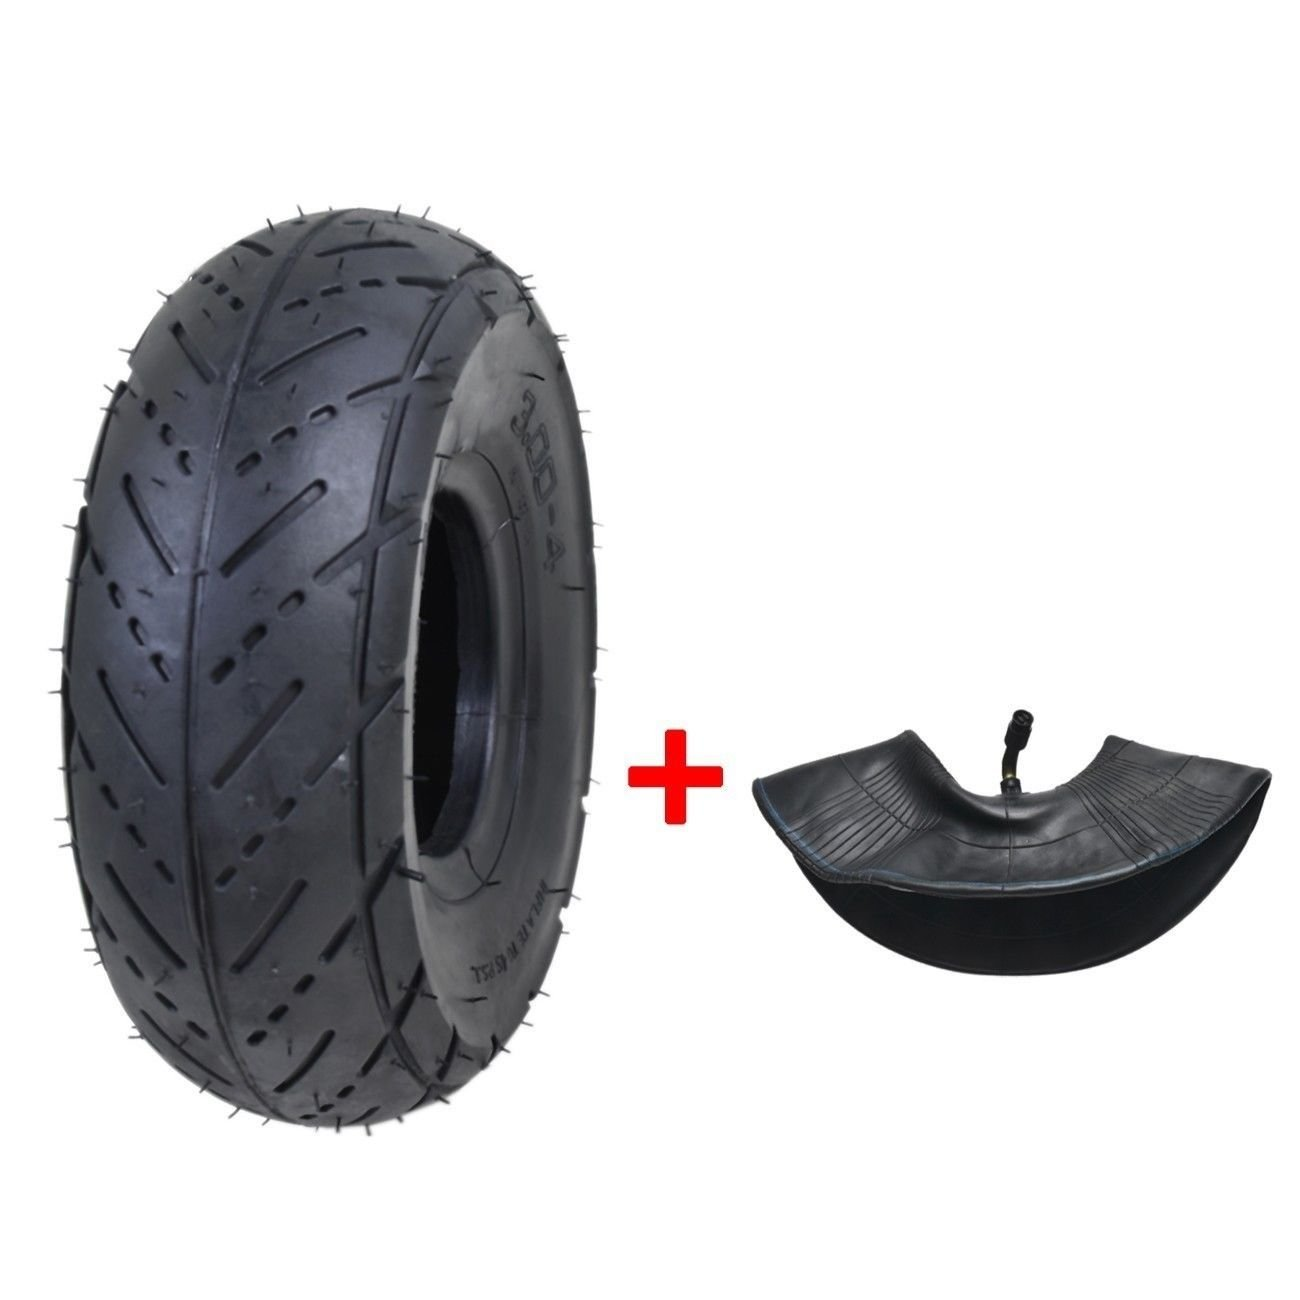 3.00-4/260 x 85 Tires+Tube for Electric Scooter Go kart Mini Pocket Bike (Street Tread)